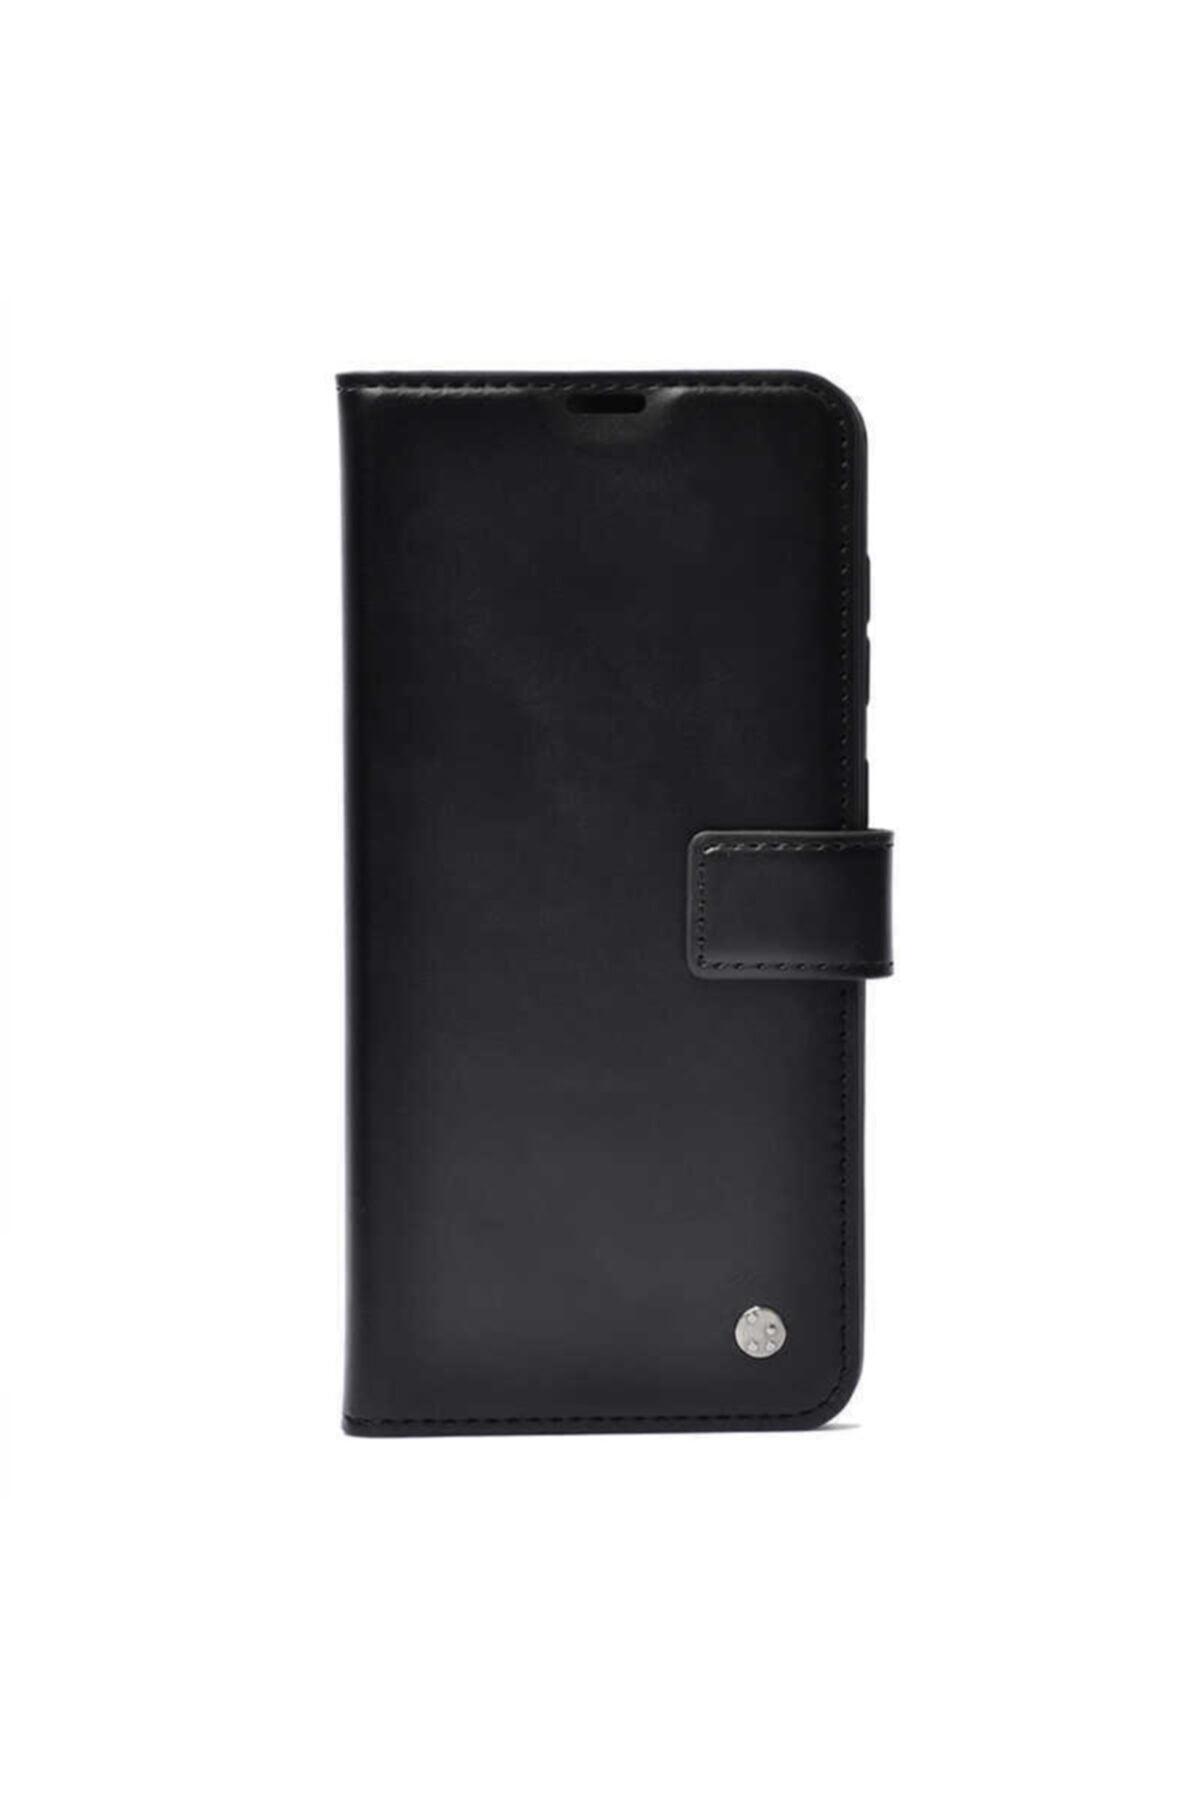 Xiaomi Redmi Note 9 Pro Kapaklı Cüzdanlı Kılıf Siyah 1